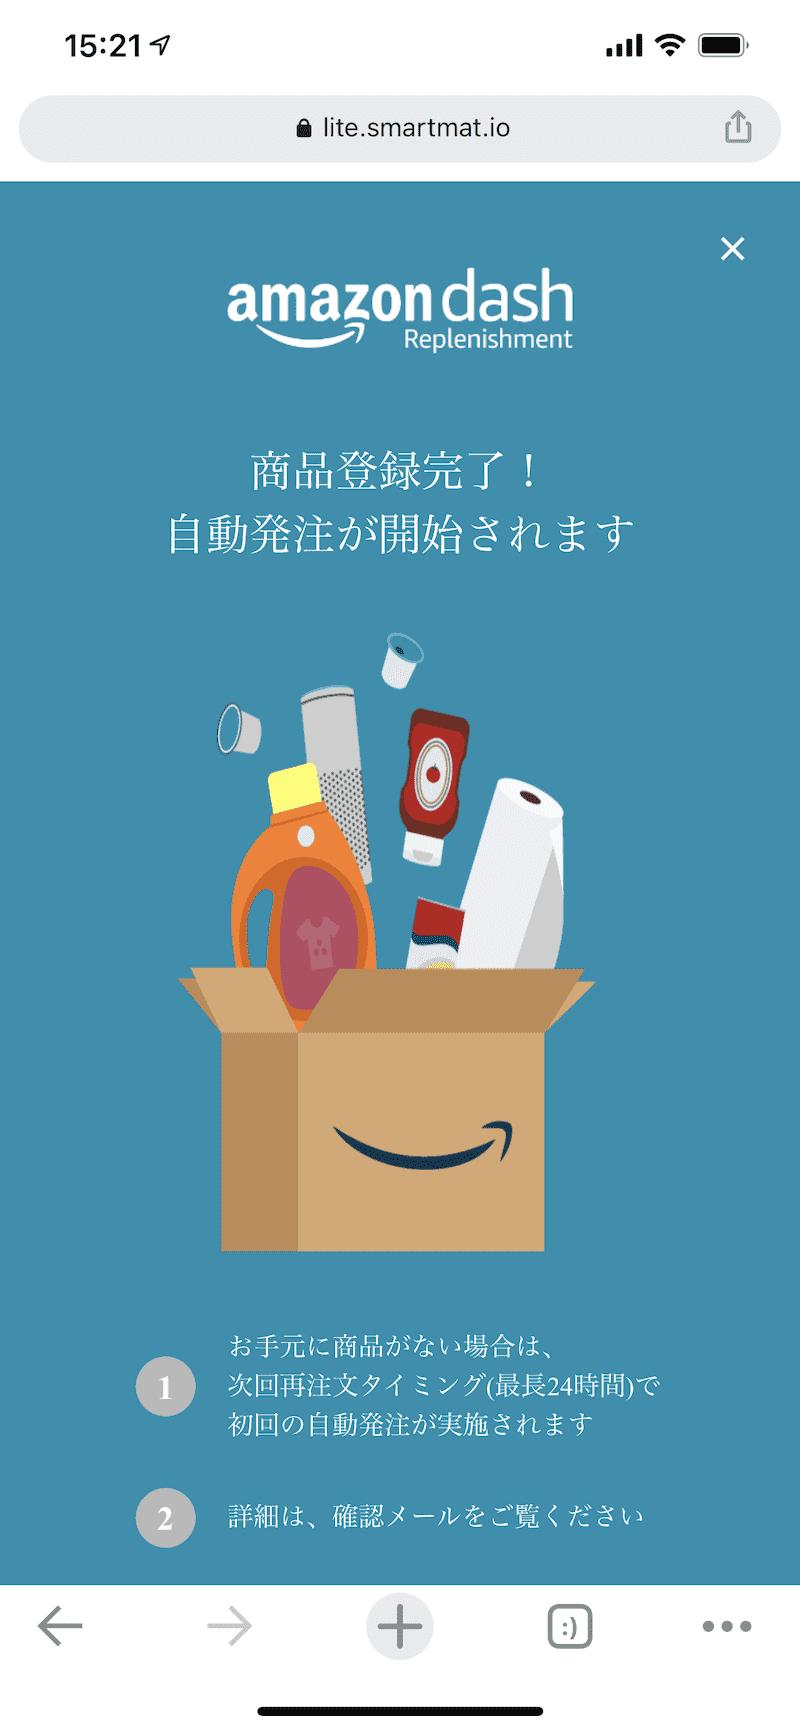 Amazon dash の商品登録完了時のスクリーンショット